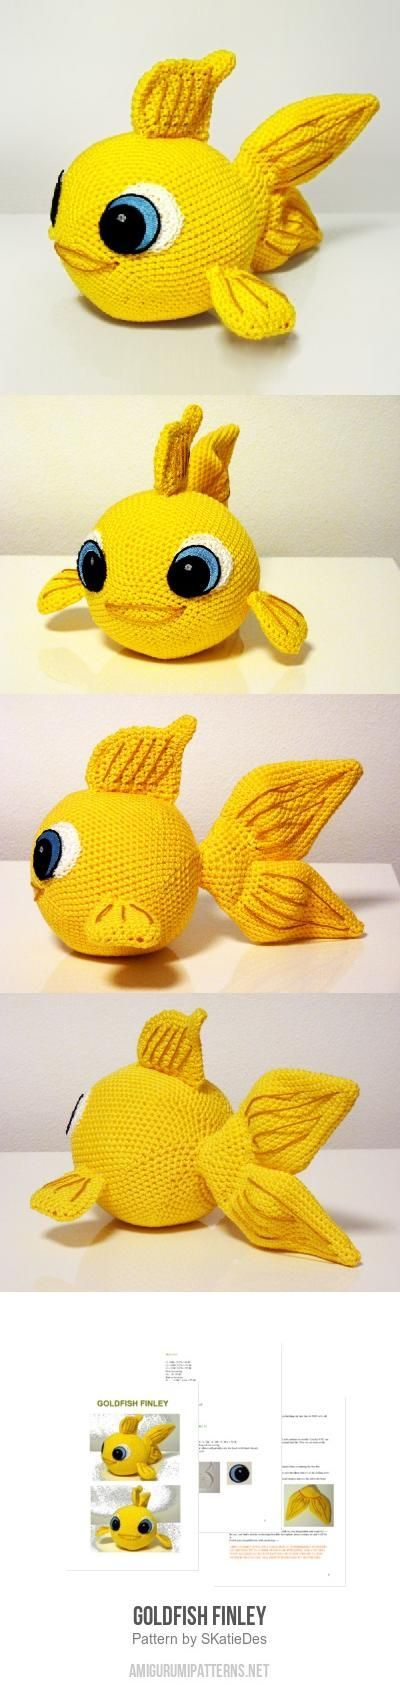 Goldfish Finley Amigurumi Pattern